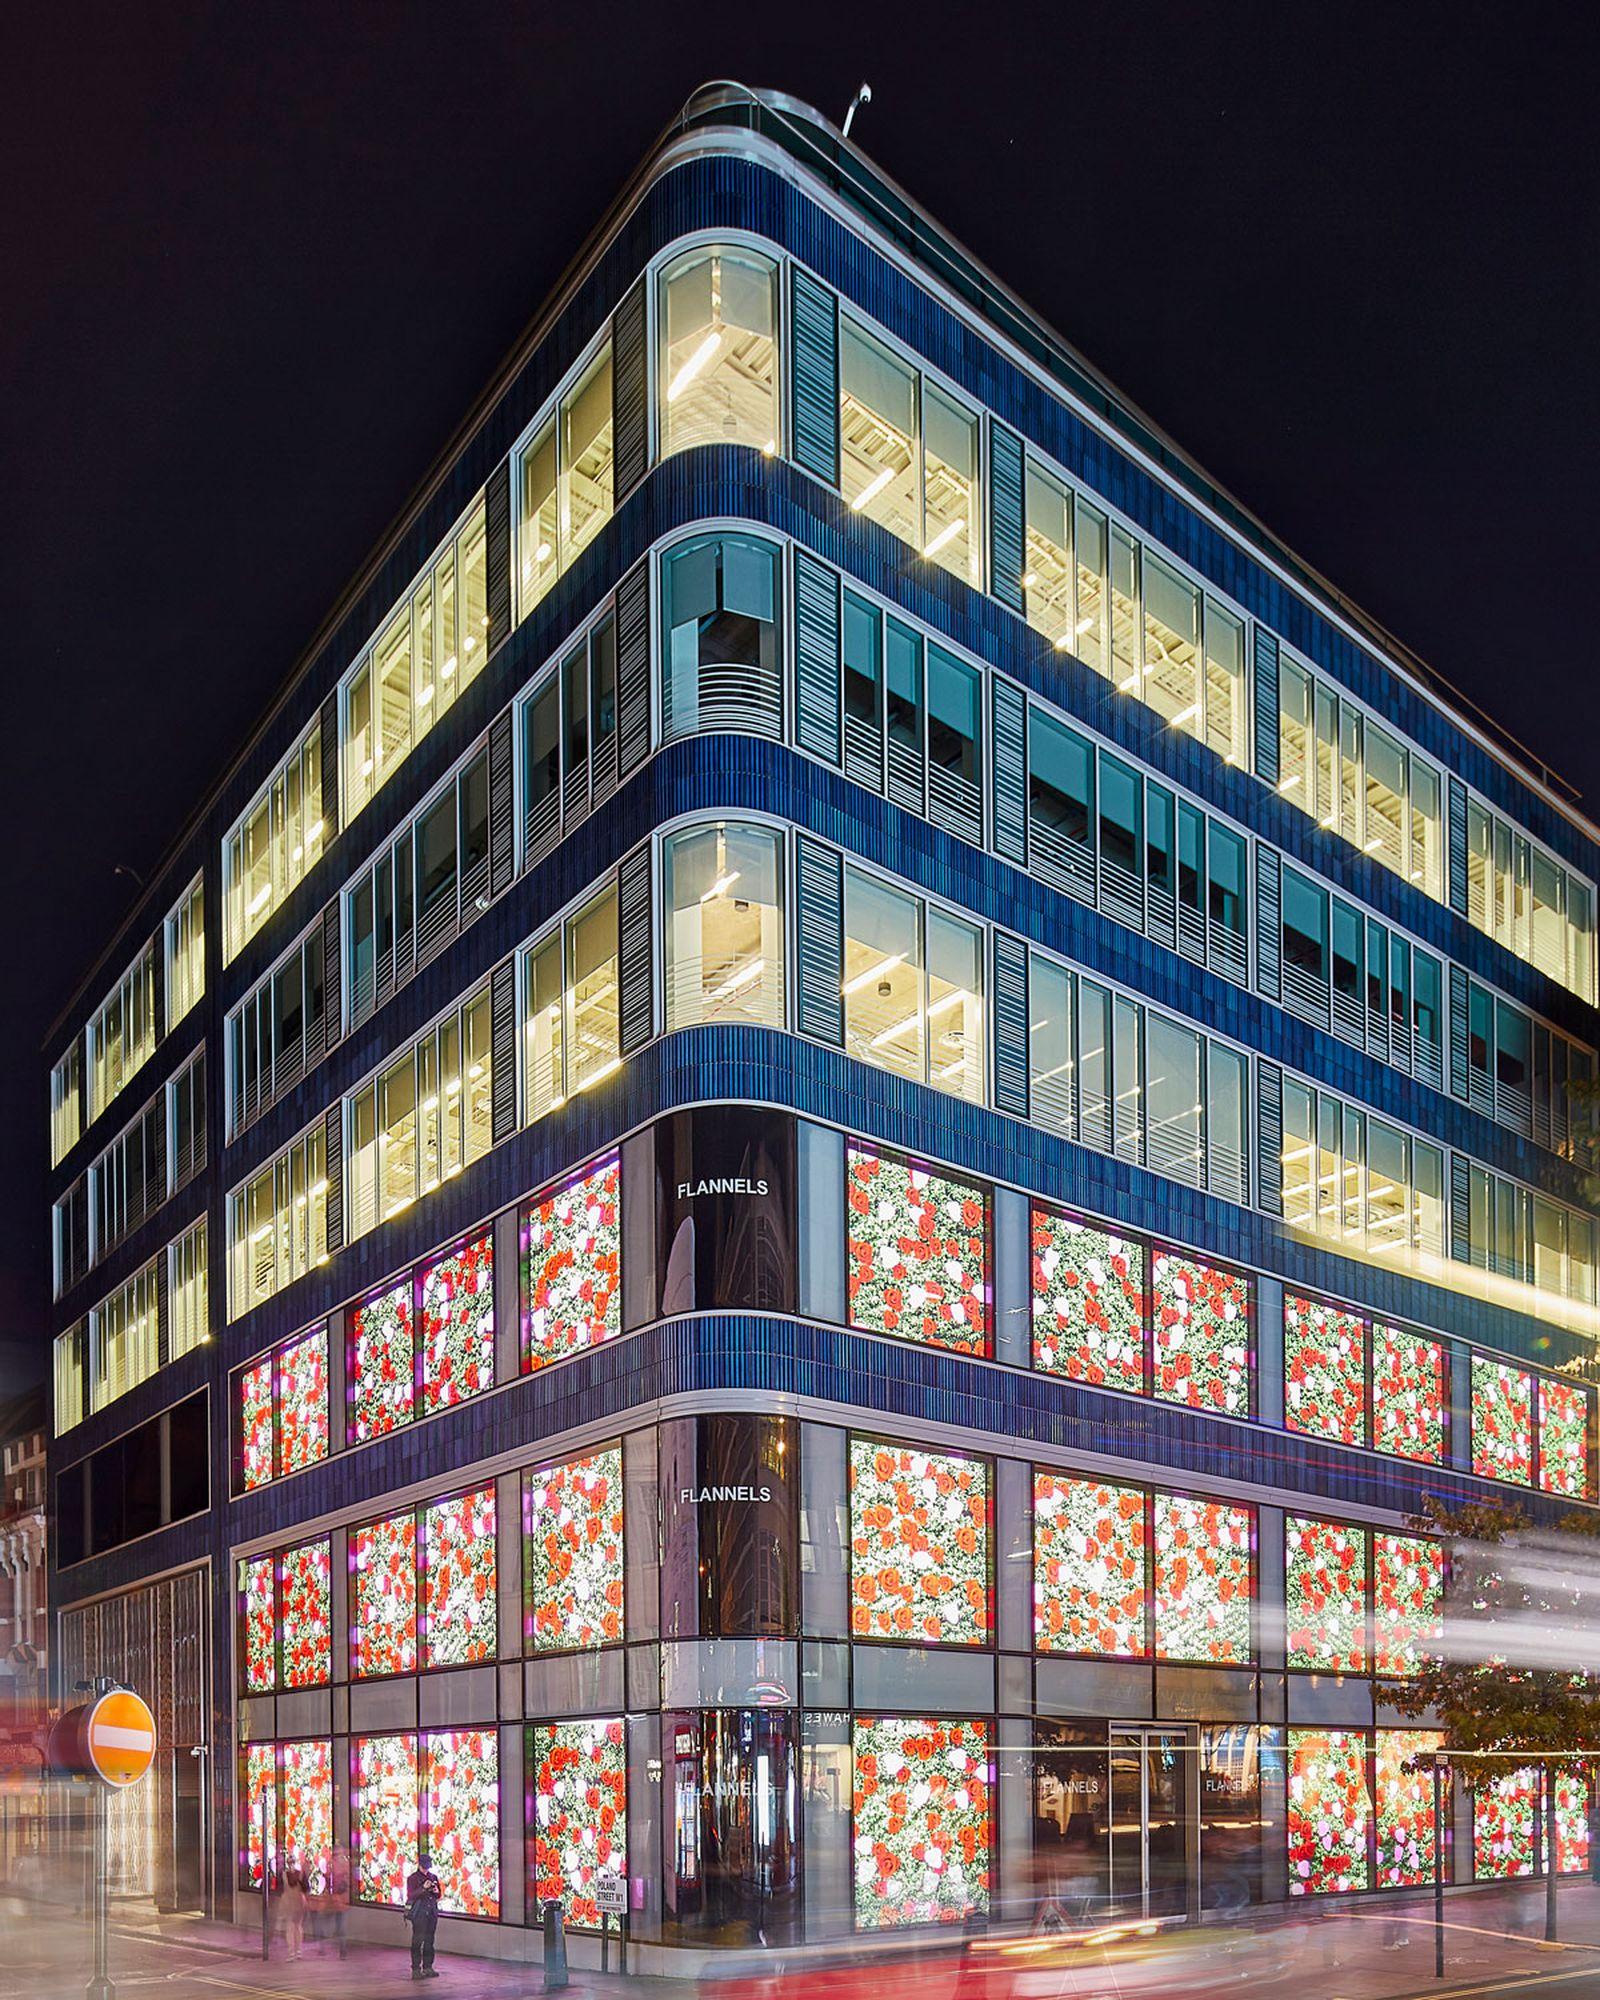 flannels biggest luxury retailer youve never heard of gen z london